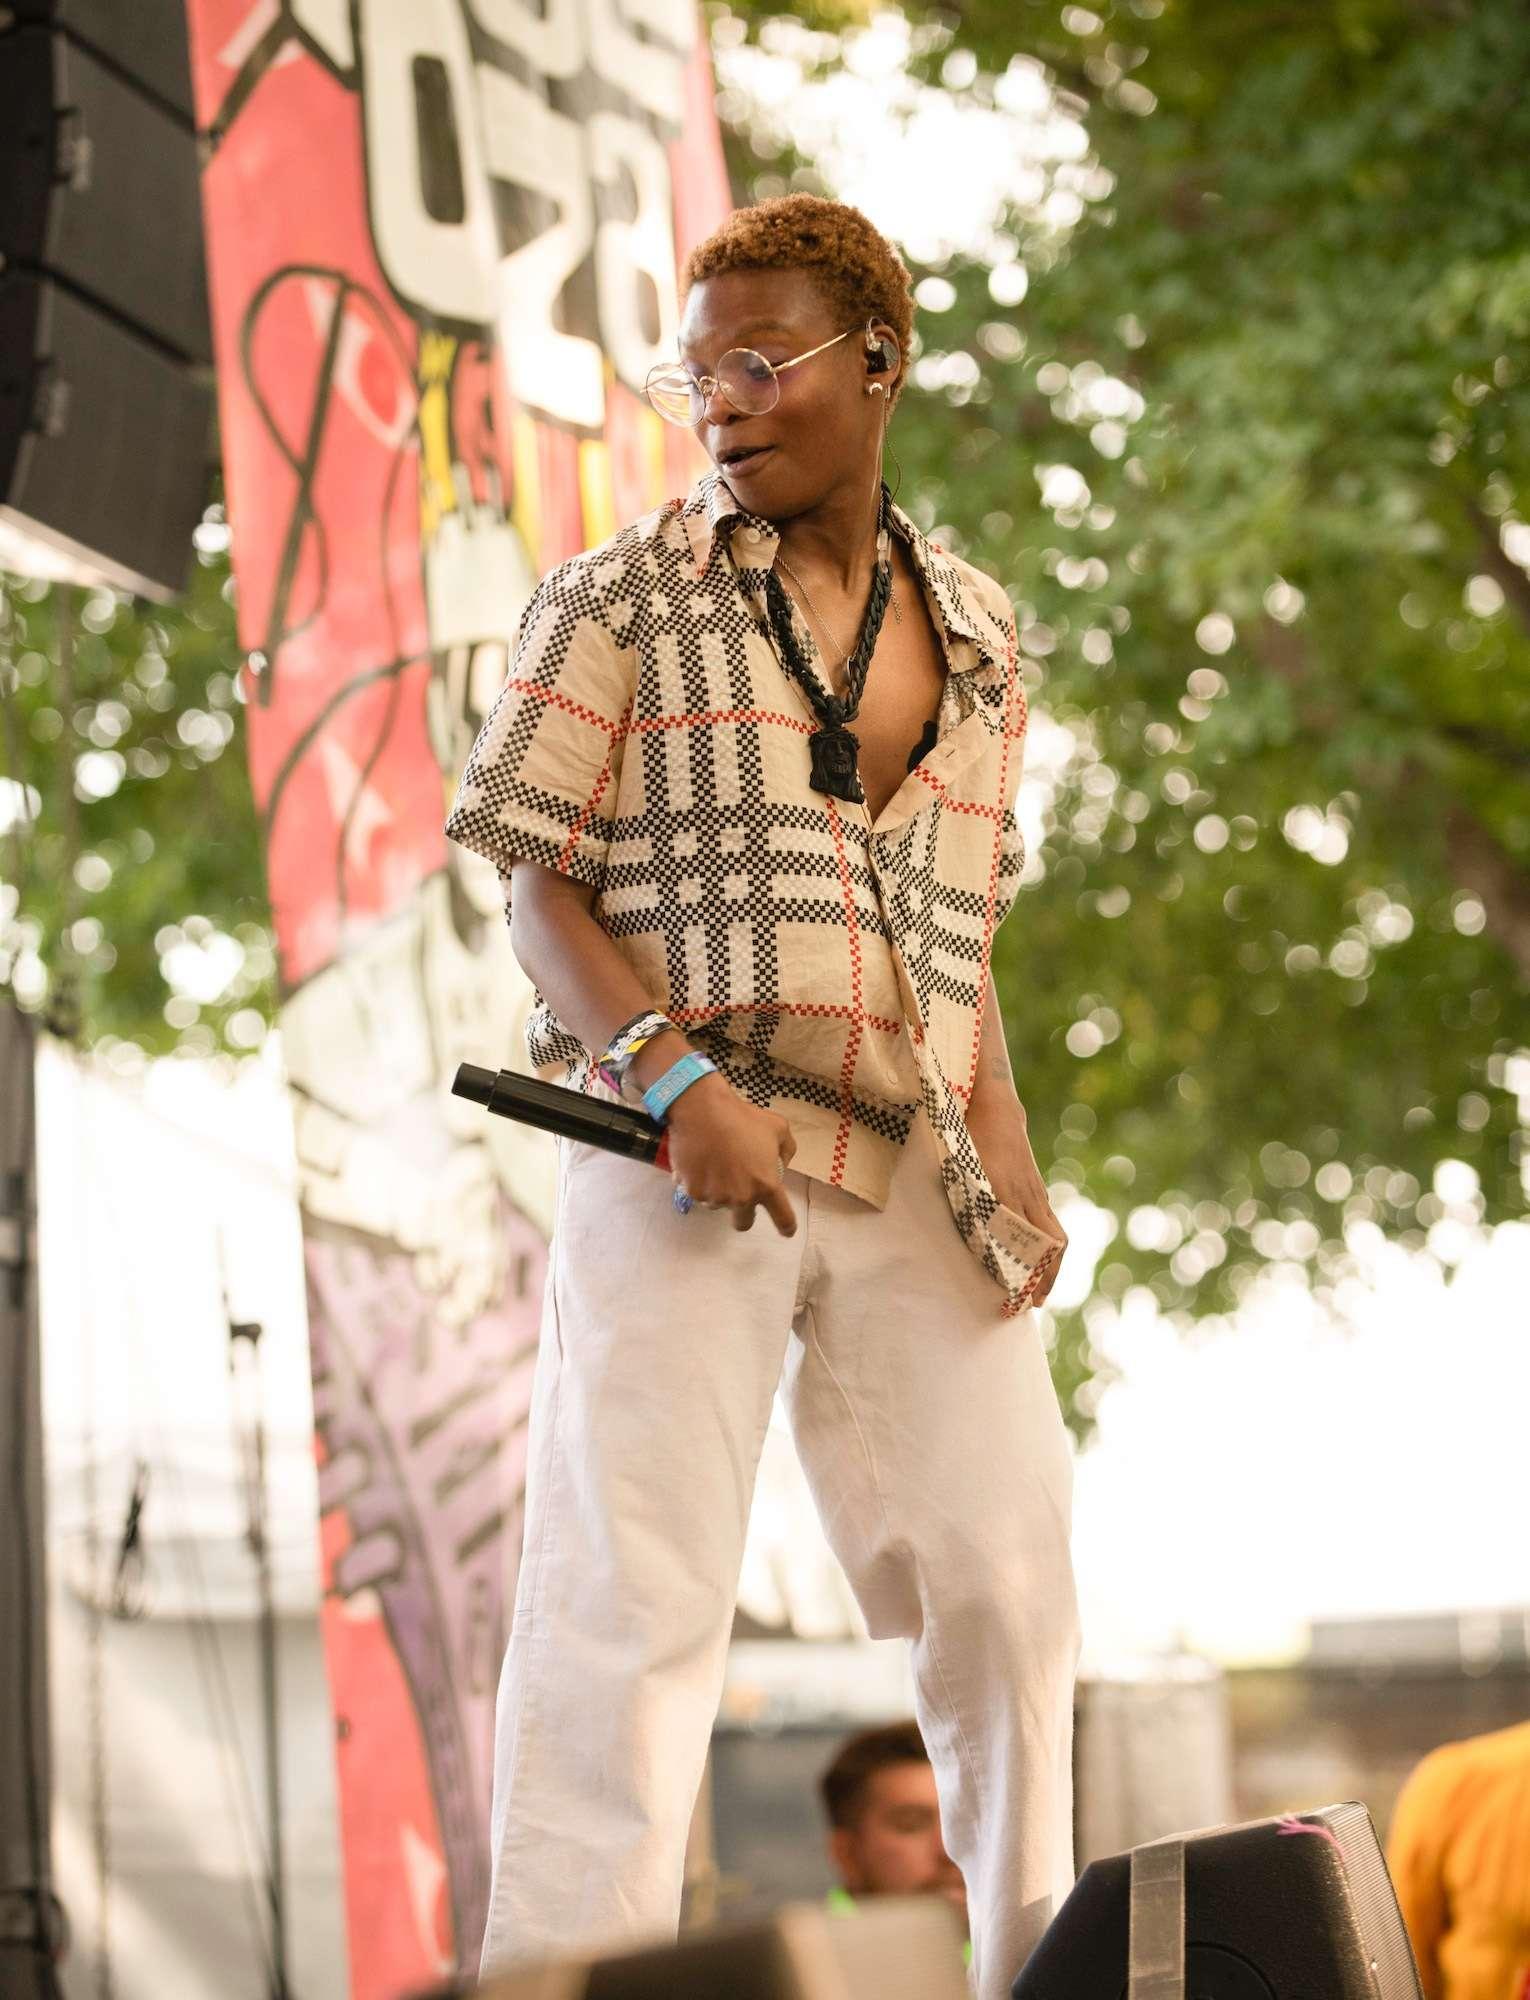 Serena Isioma Live at Lollapalooza [GALLERY] 8